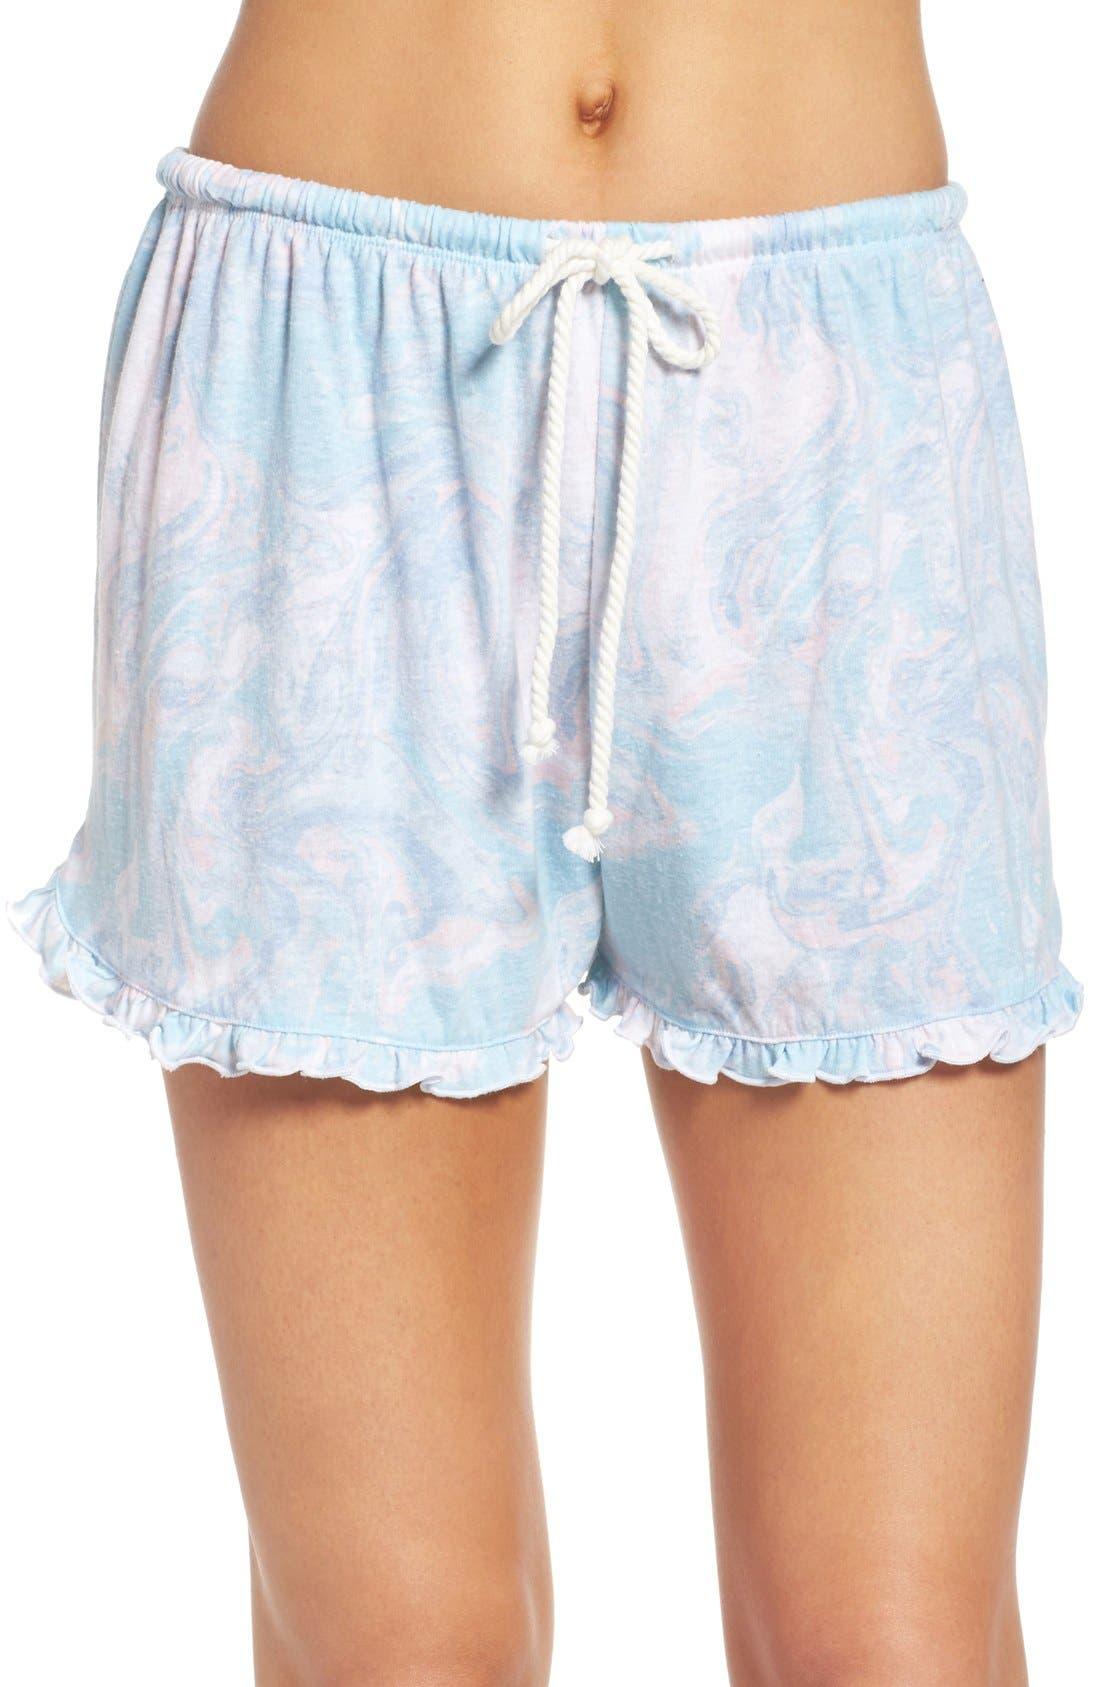 Alternate Image 1 Selected - Make + Model Ruffle Shorts